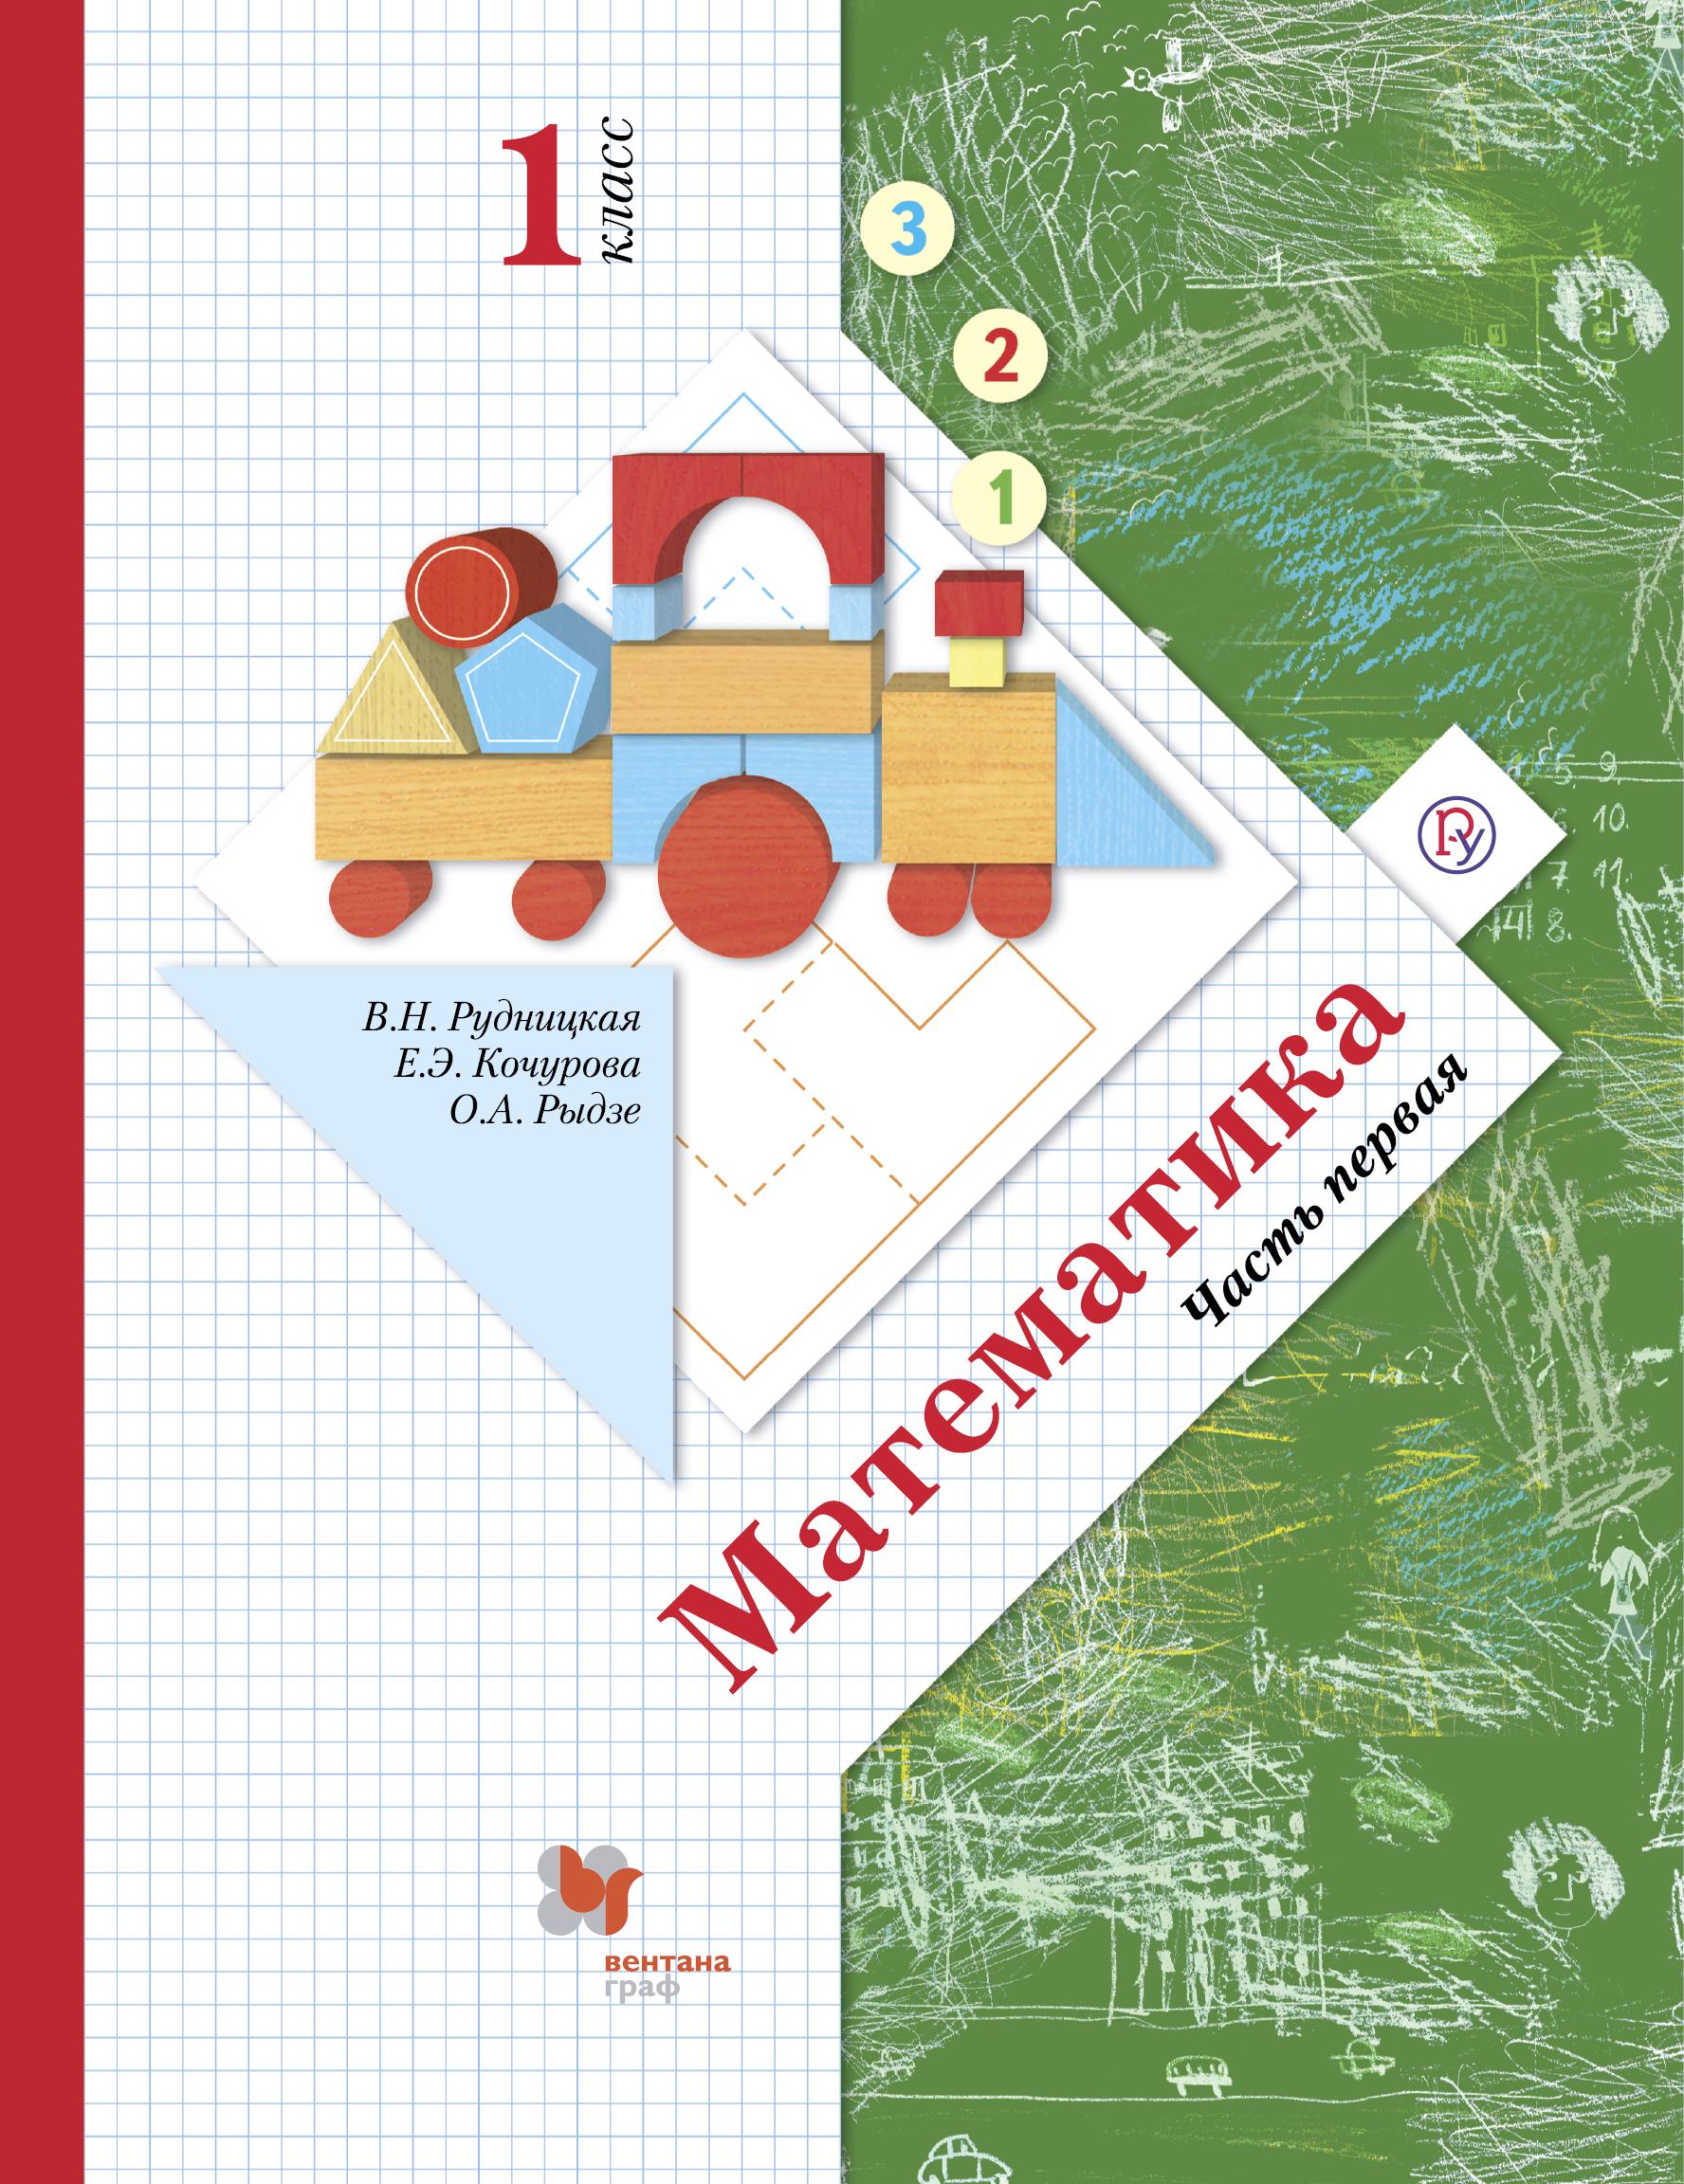 Рудницкая В.Н., Кочурова Е.Э., Рыдзе О.А. Математика. 1 класс. Учебник в 2-х частях. Ч. 1. в н рудницкая е э кочурова о а рыдзе математика 1класс учебник в 2 частях часть 1